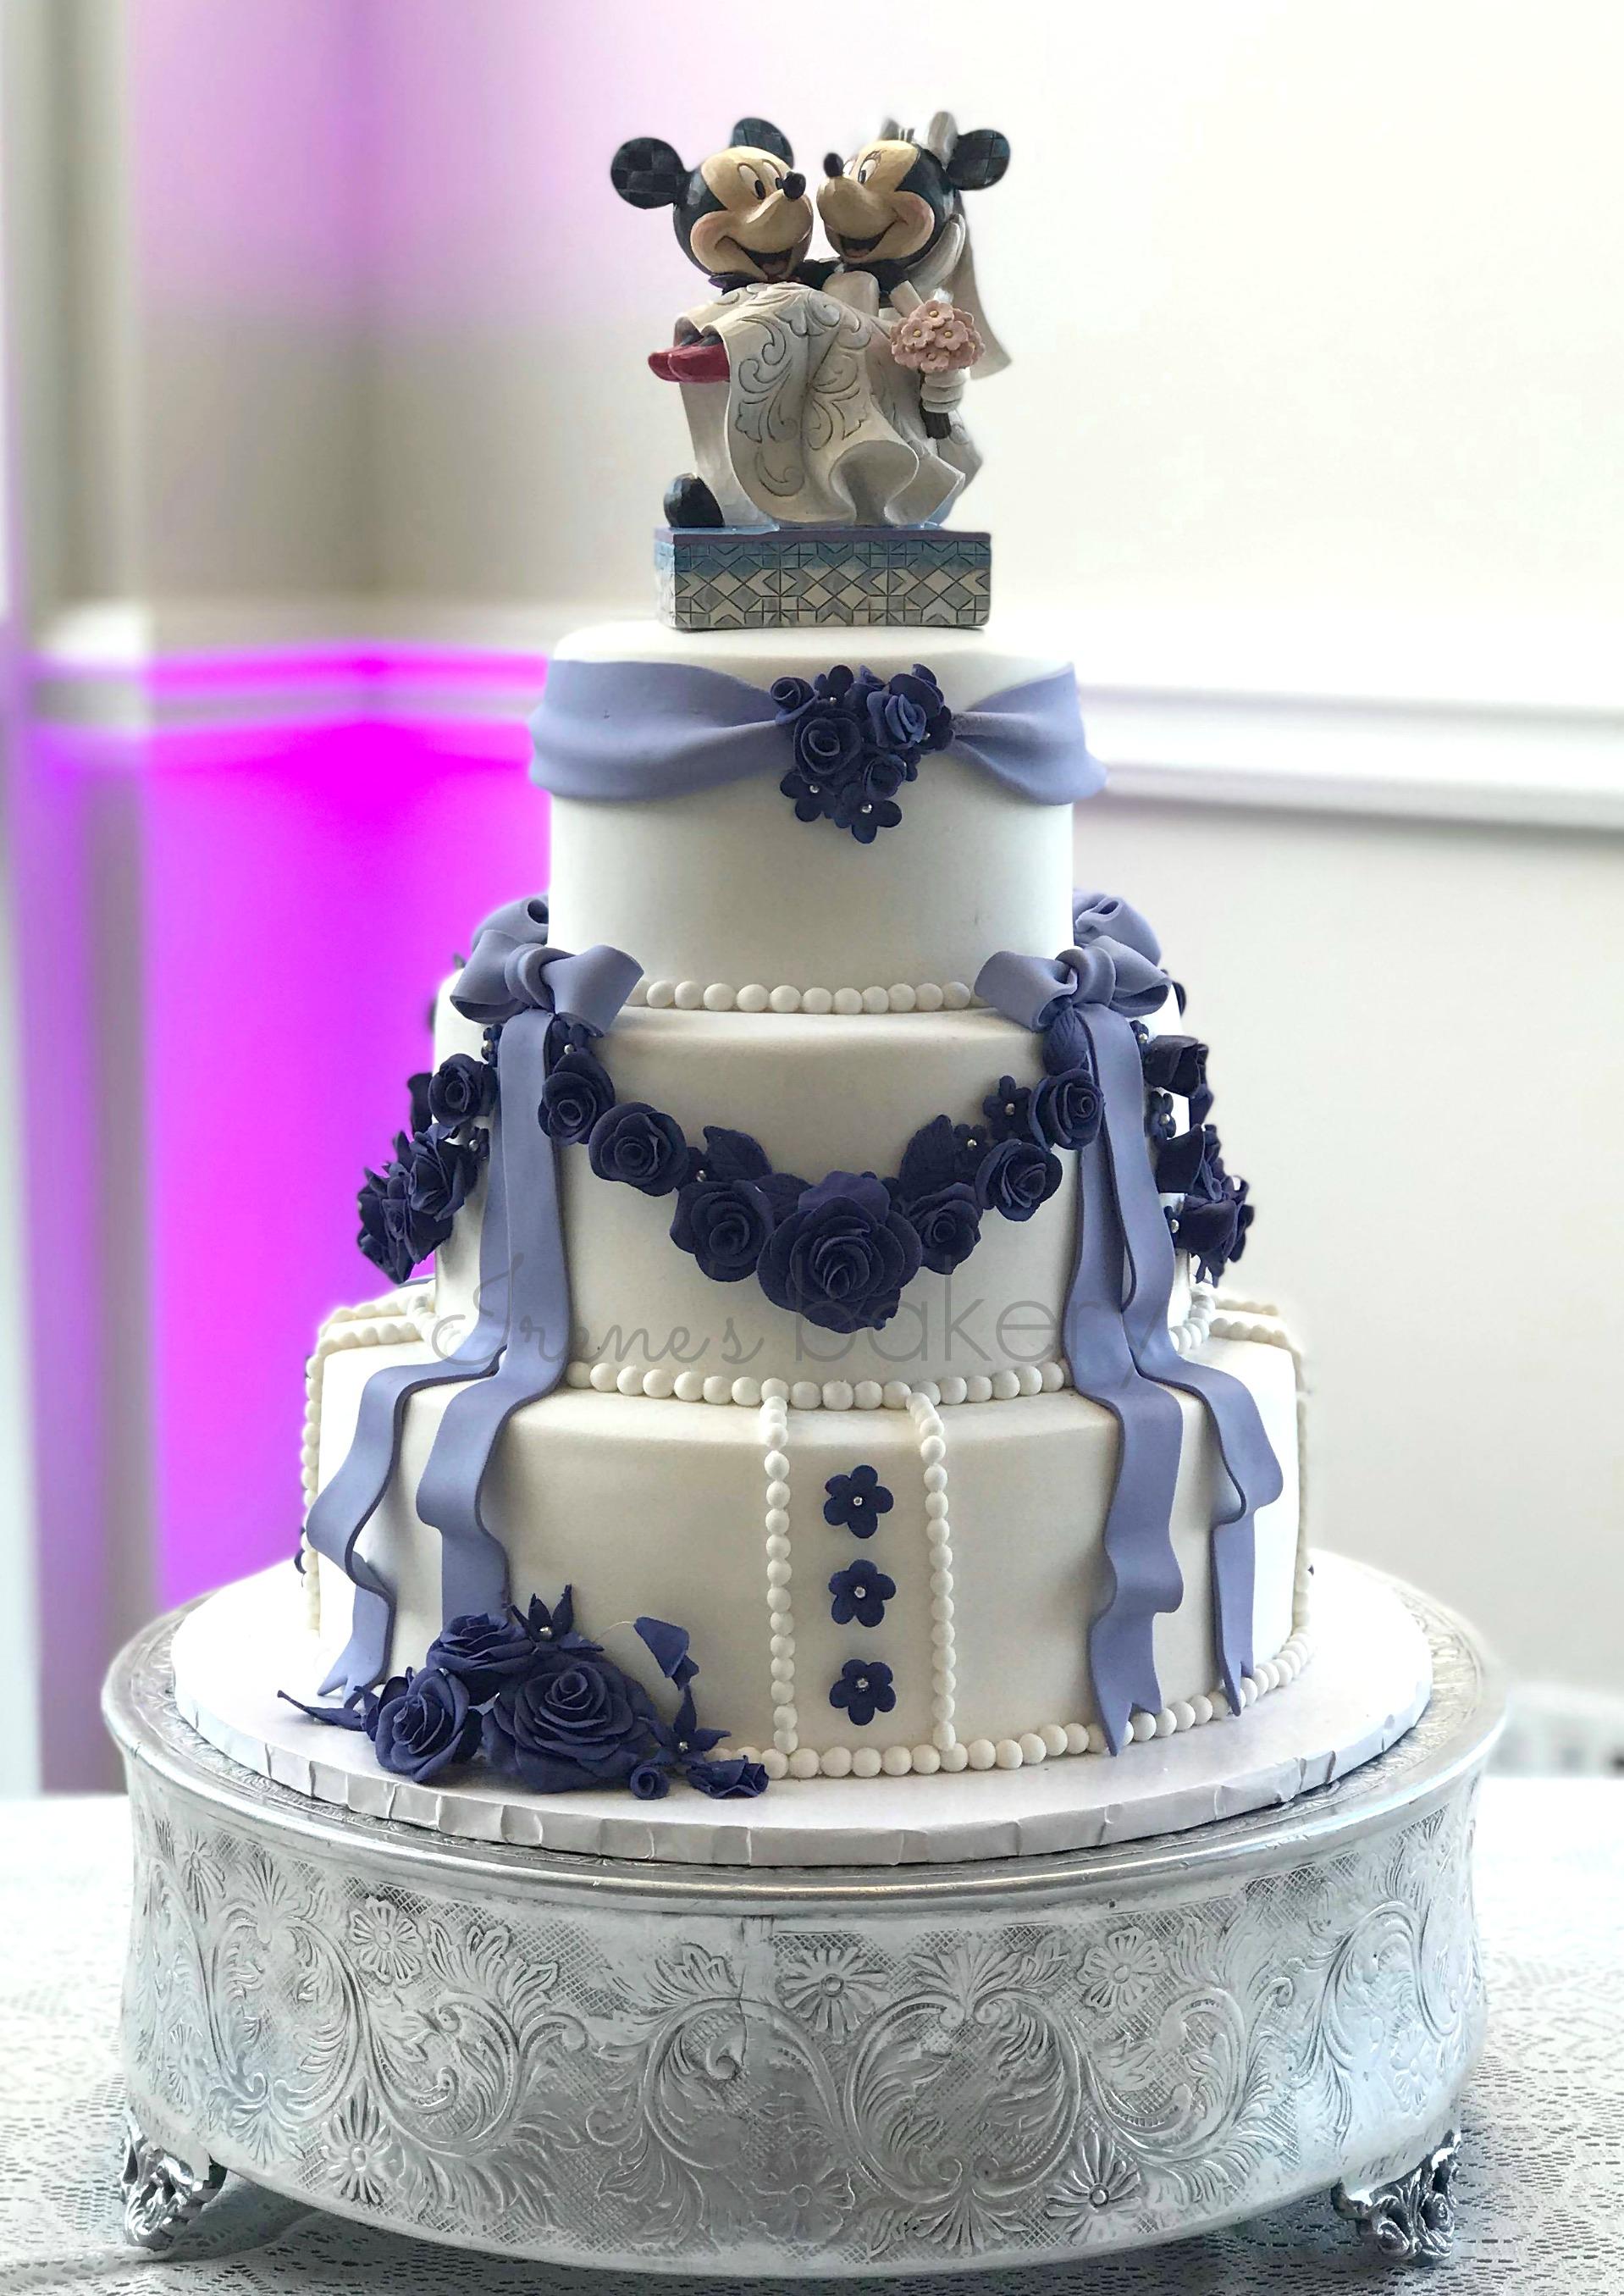 Mickey + Minnie wedding cake - irenes bakery